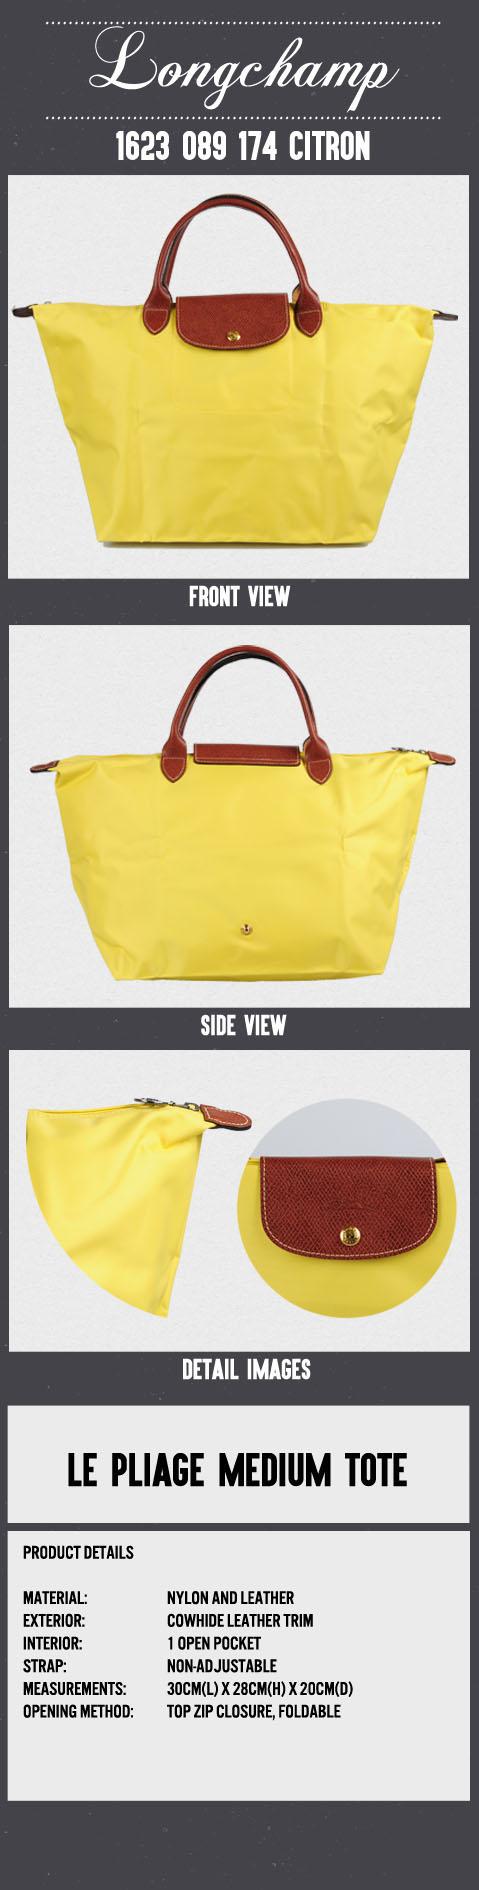 Buy Best Longchamp Jacquard Tote Bags 1621 510 001 Noir black